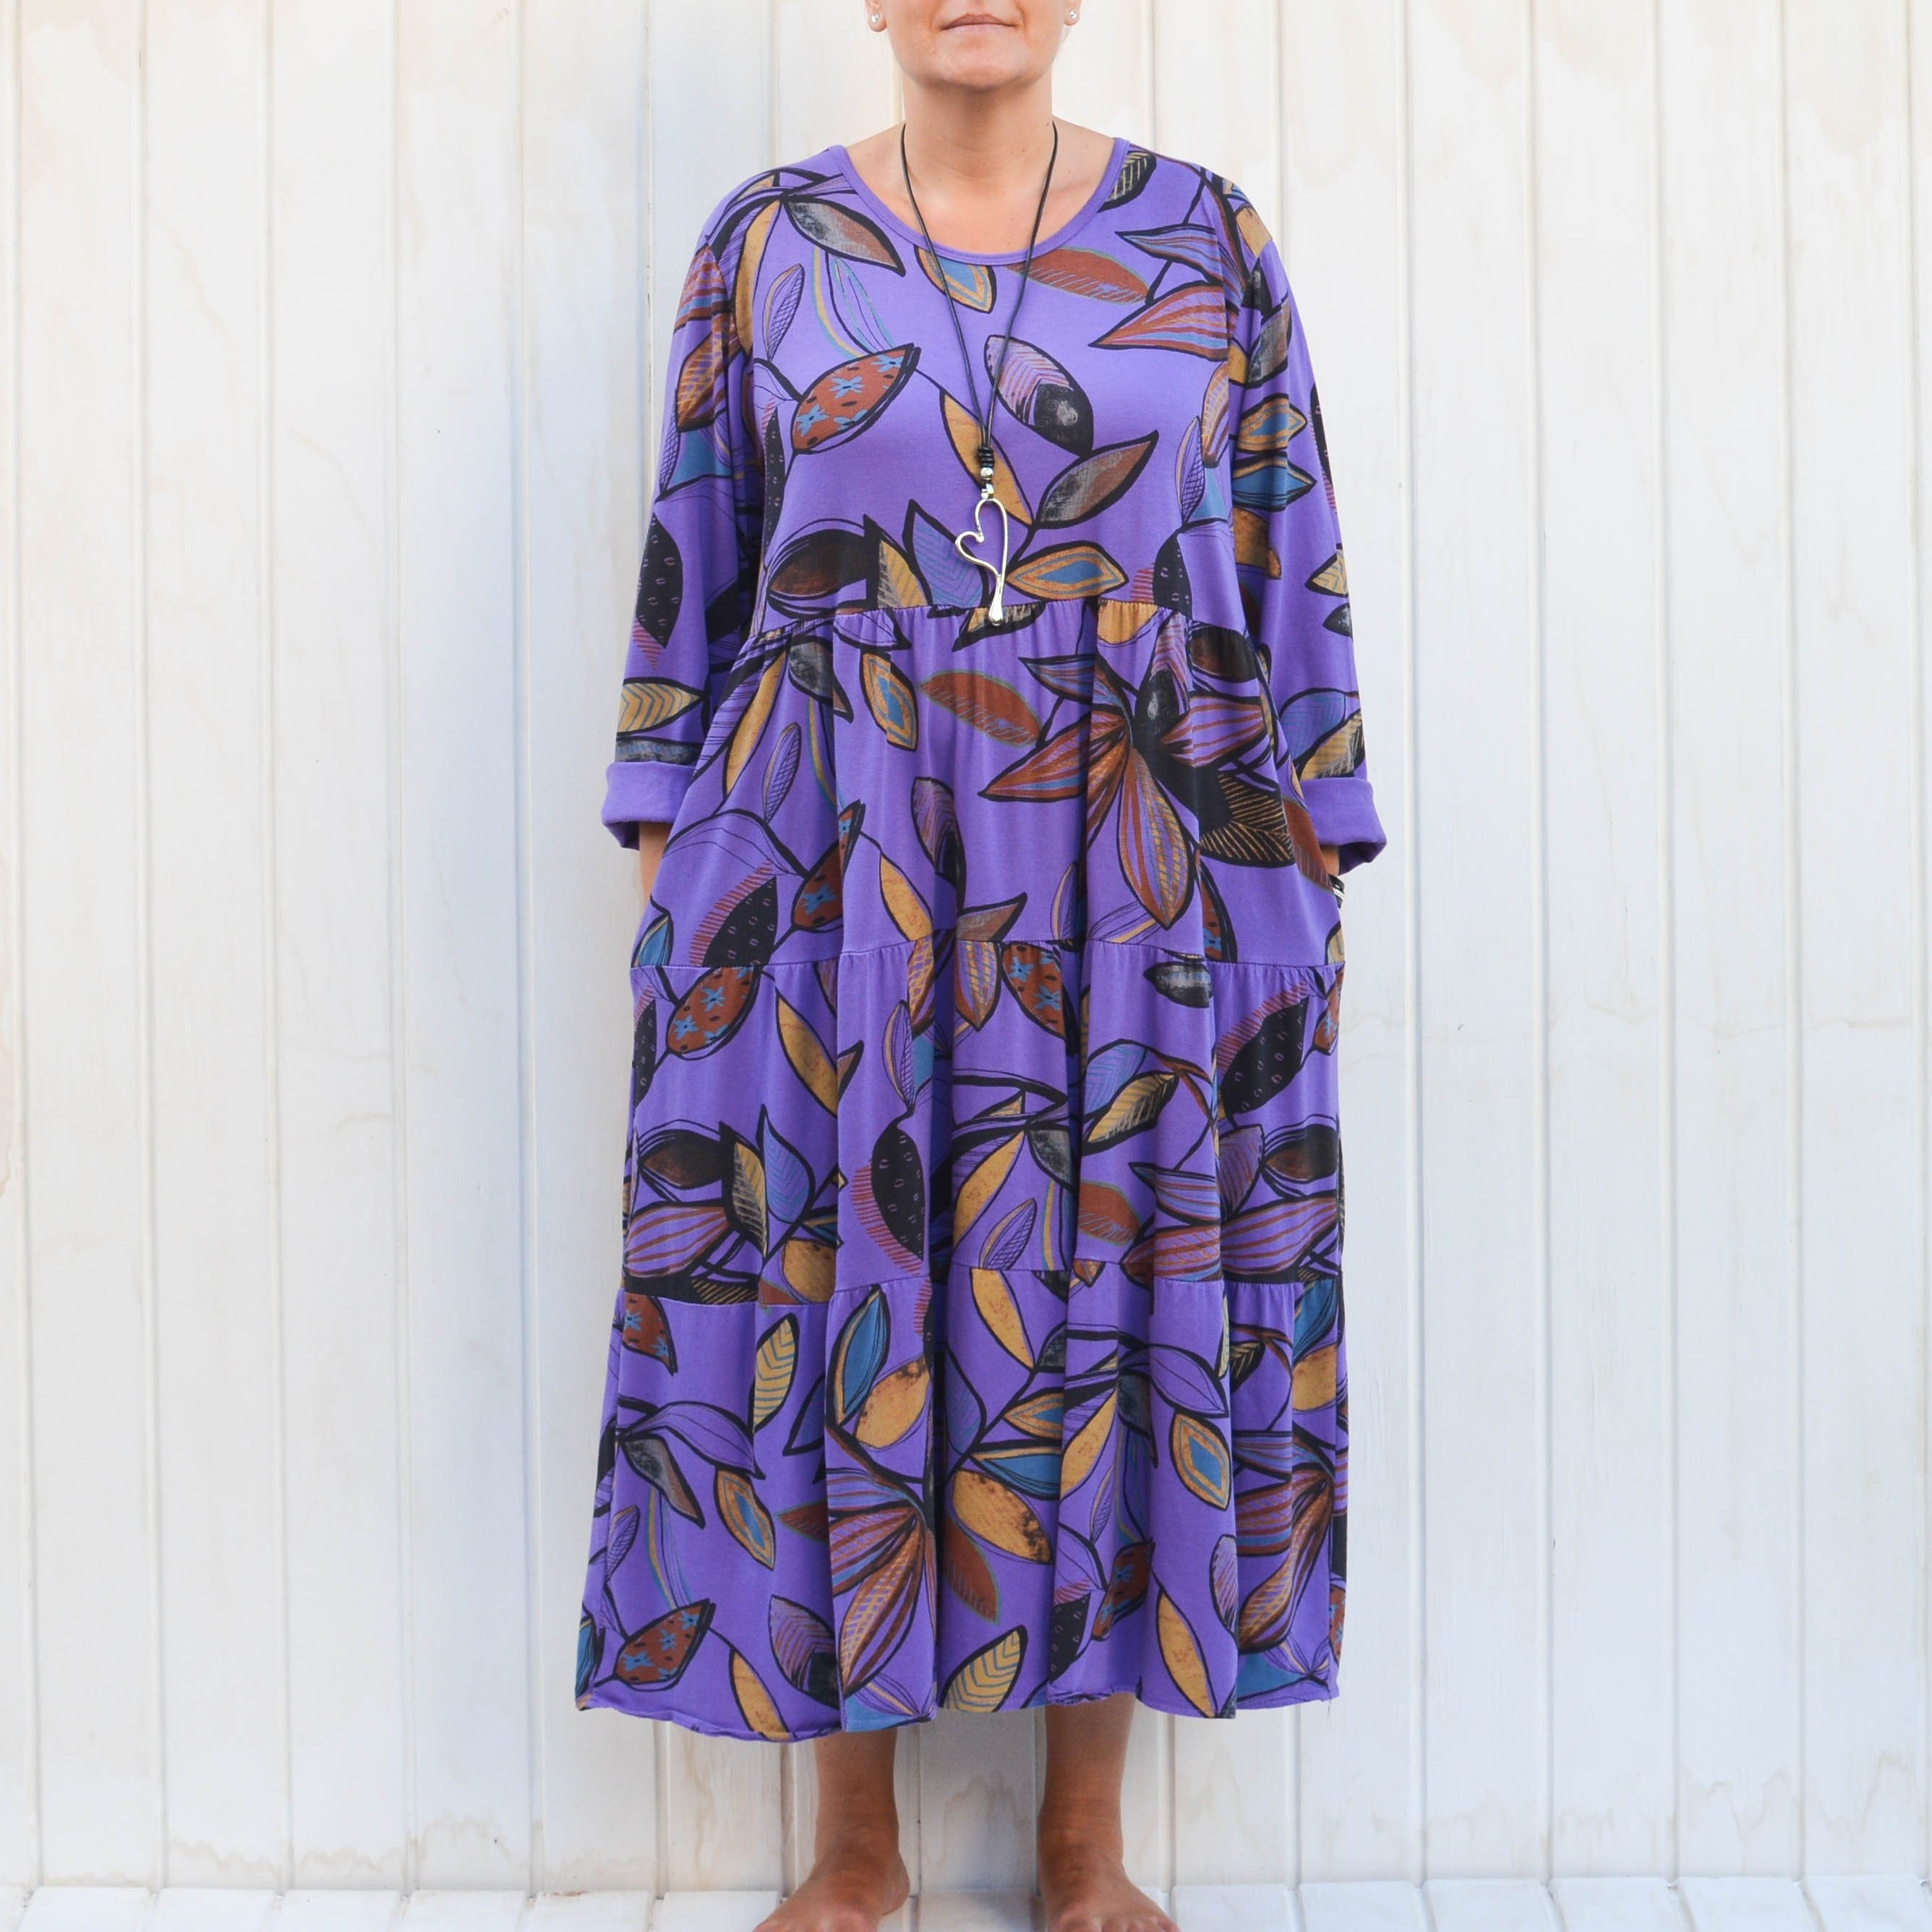 bff9b4724d6f3 Uk Dress Size 20 22